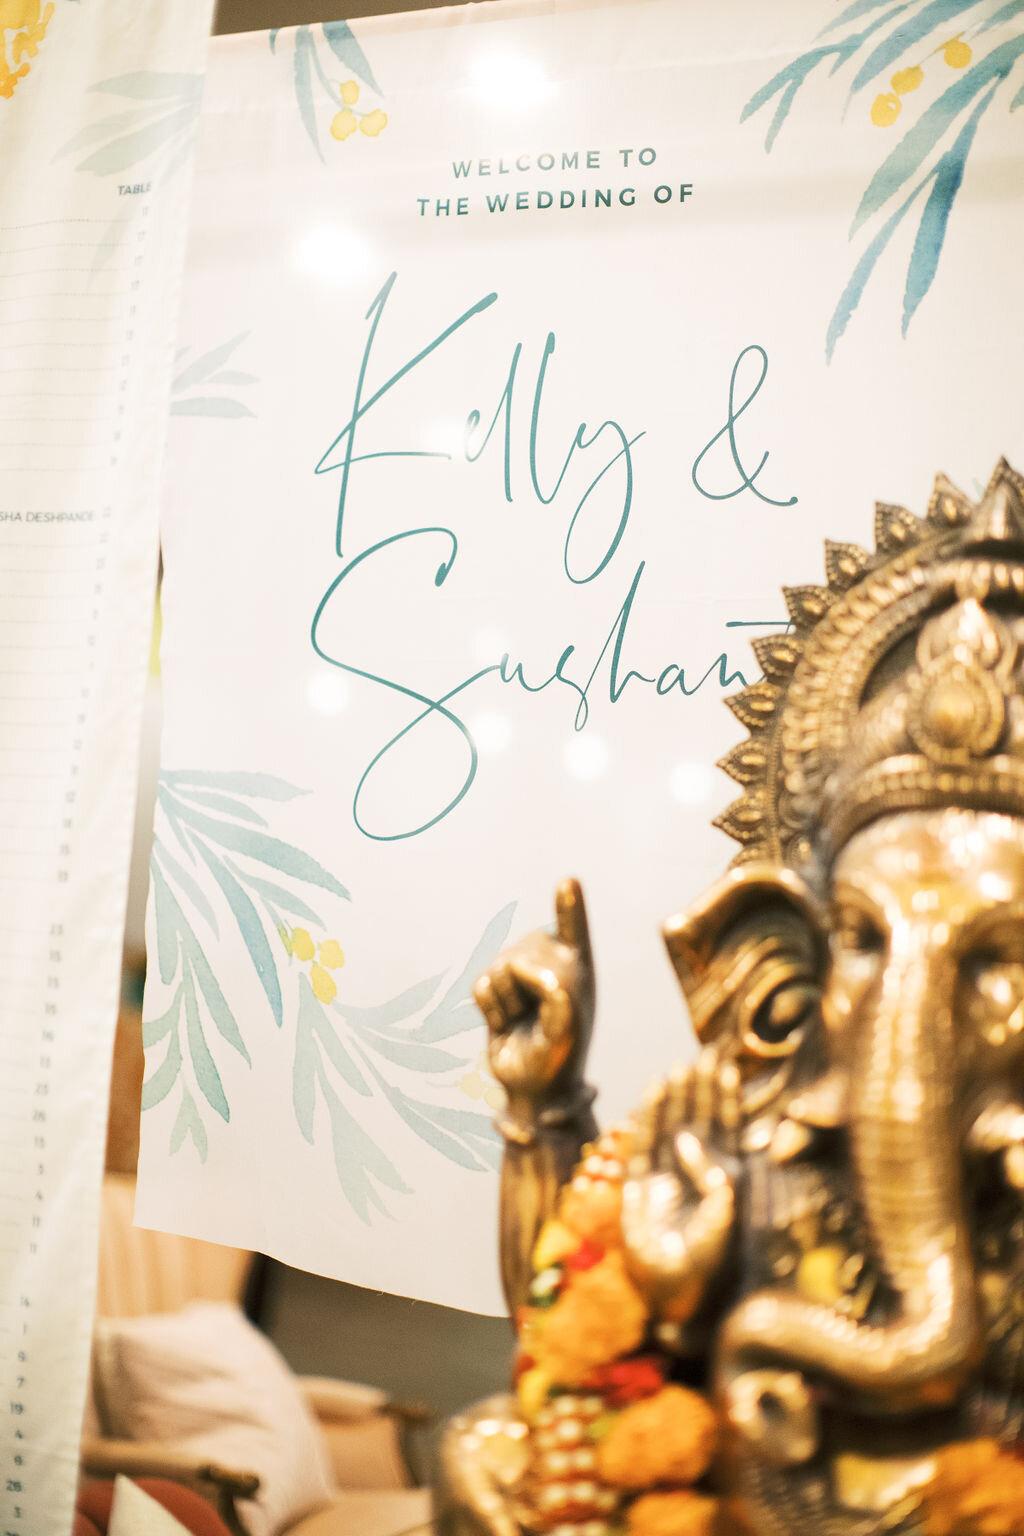 Alexandra-Elise-Photography-Ali-Reed-Film-Indian-Wedding-Photographer-Rochester-New-York-Saturday-Reception-057.jpg